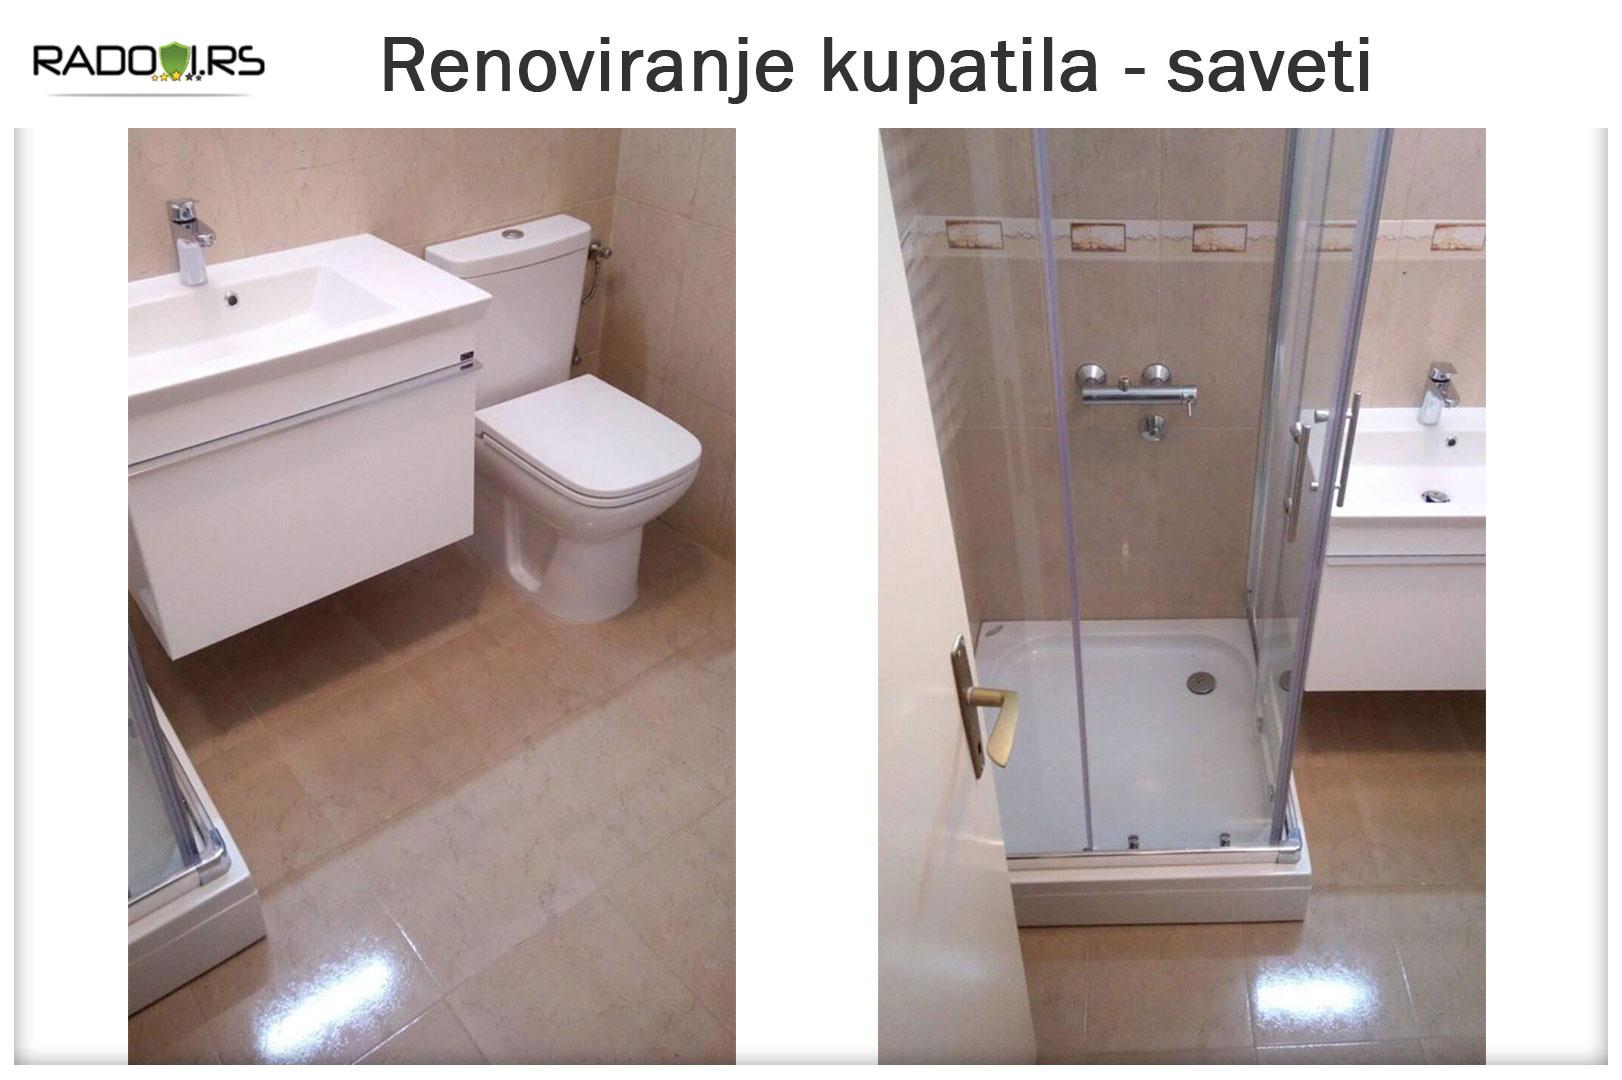 Renoviranje kupatila(adaptacija kupatila) - Vodoinstalater Beograd - Radovi.rs